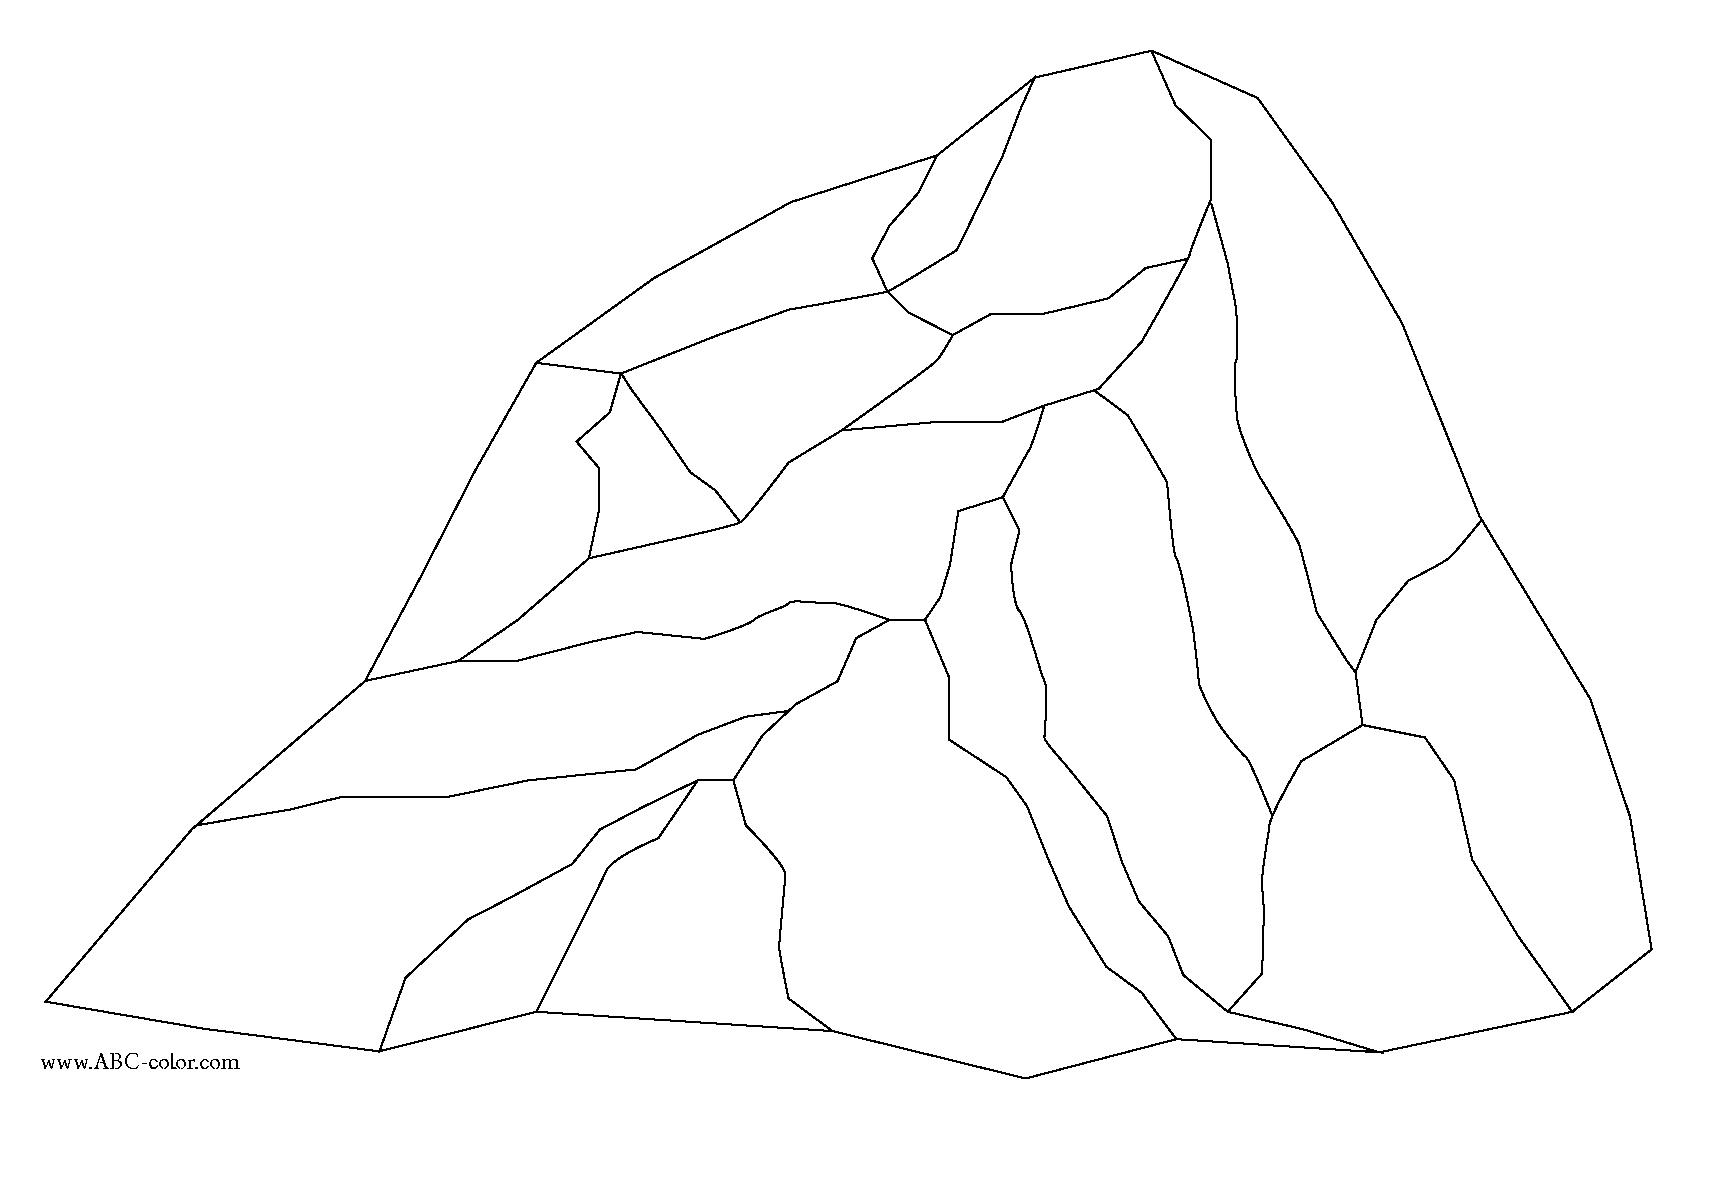 Rock Coloring Pages Printable 5 10 Kaartenstemp Nl